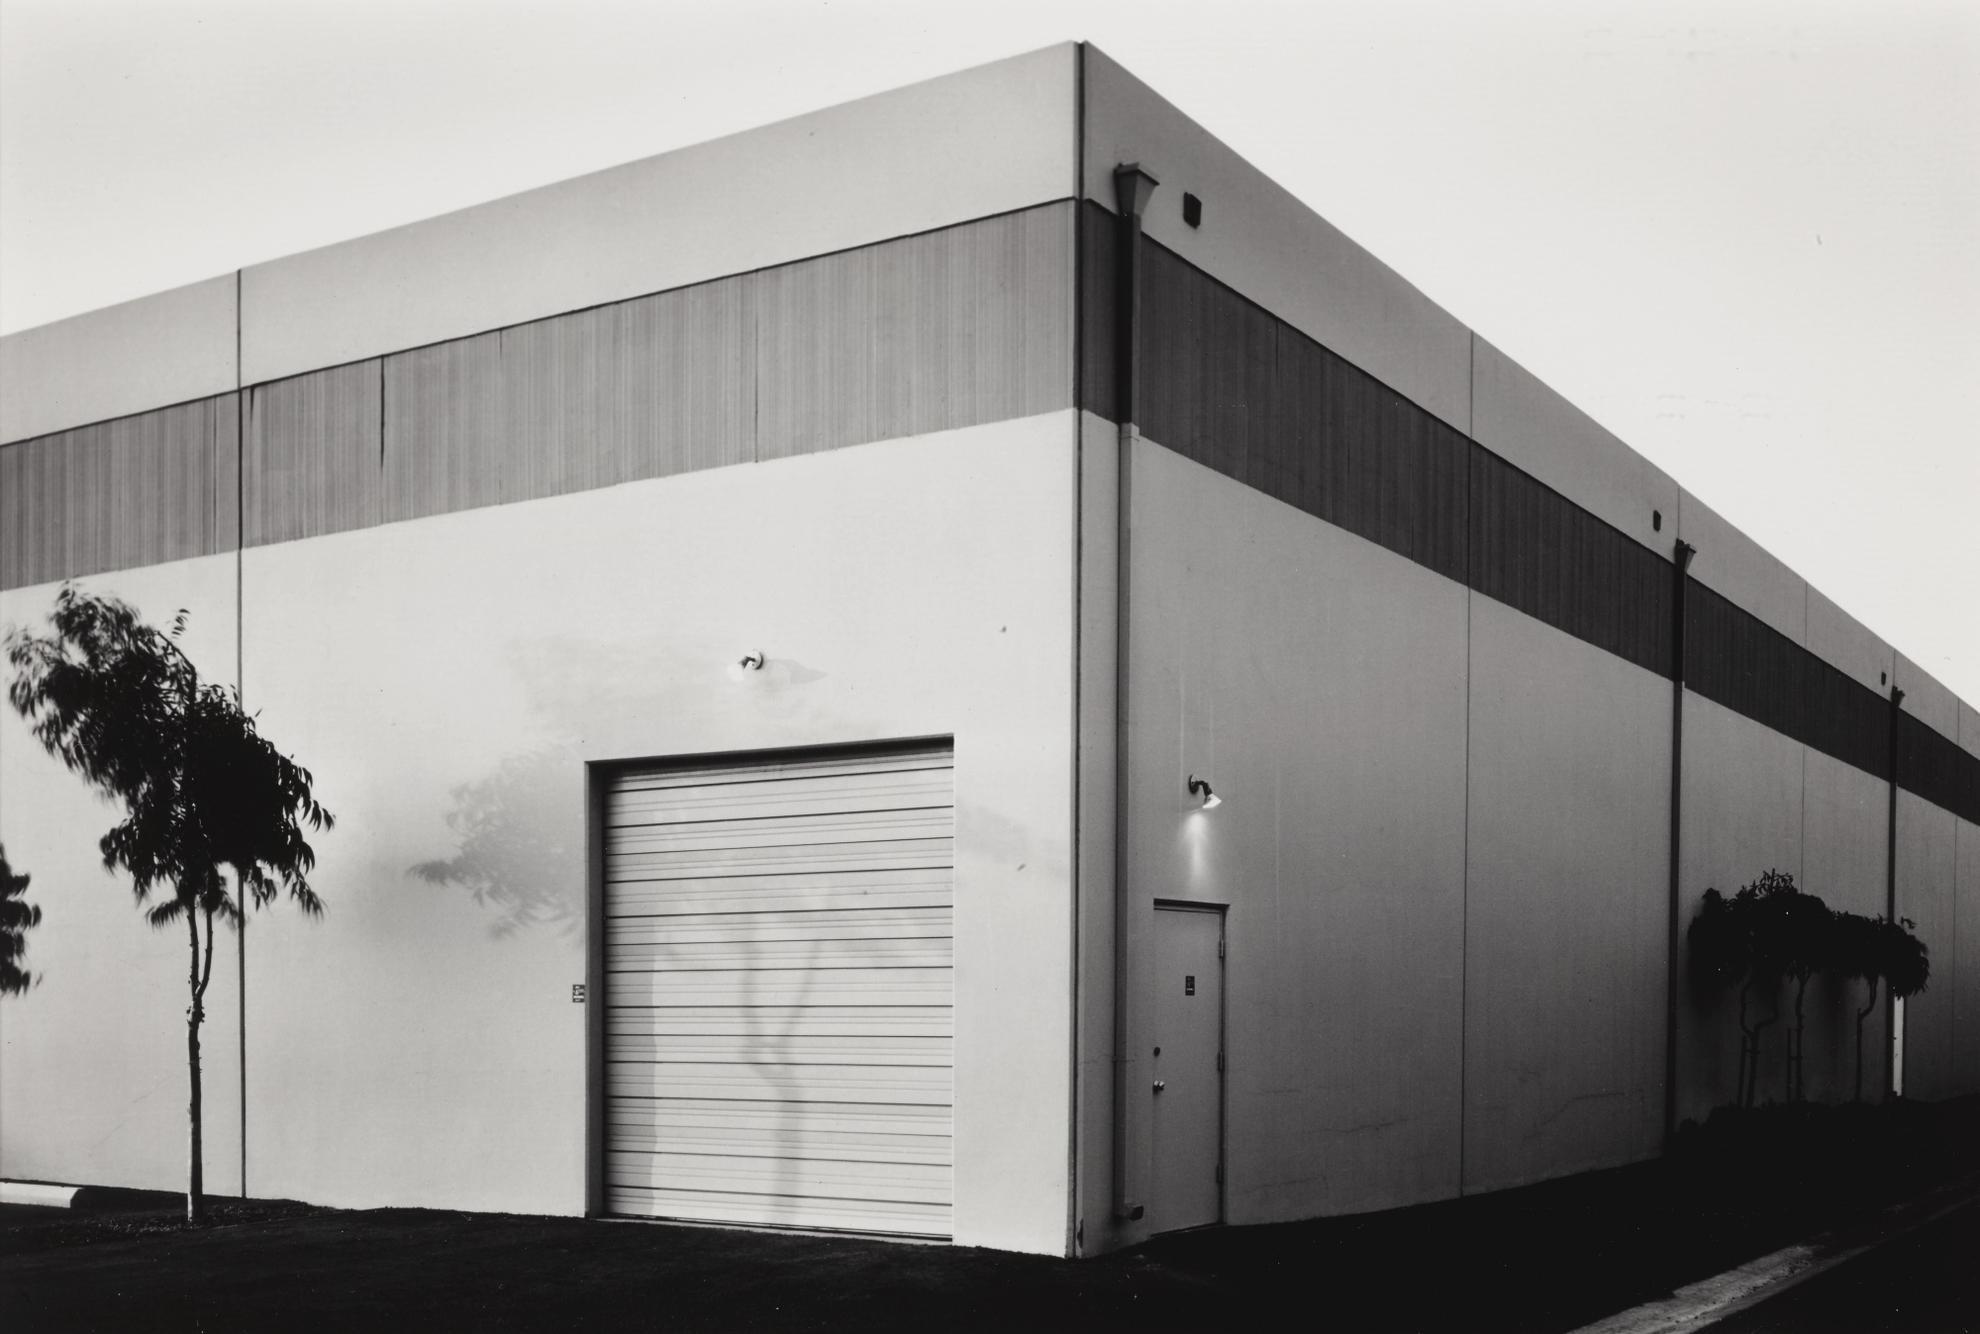 Lewis Baltz-New Industrial Parks #50: Southwest Corner, Semicoa, 333 Mccormick, Costa Mesa, Ca-1974